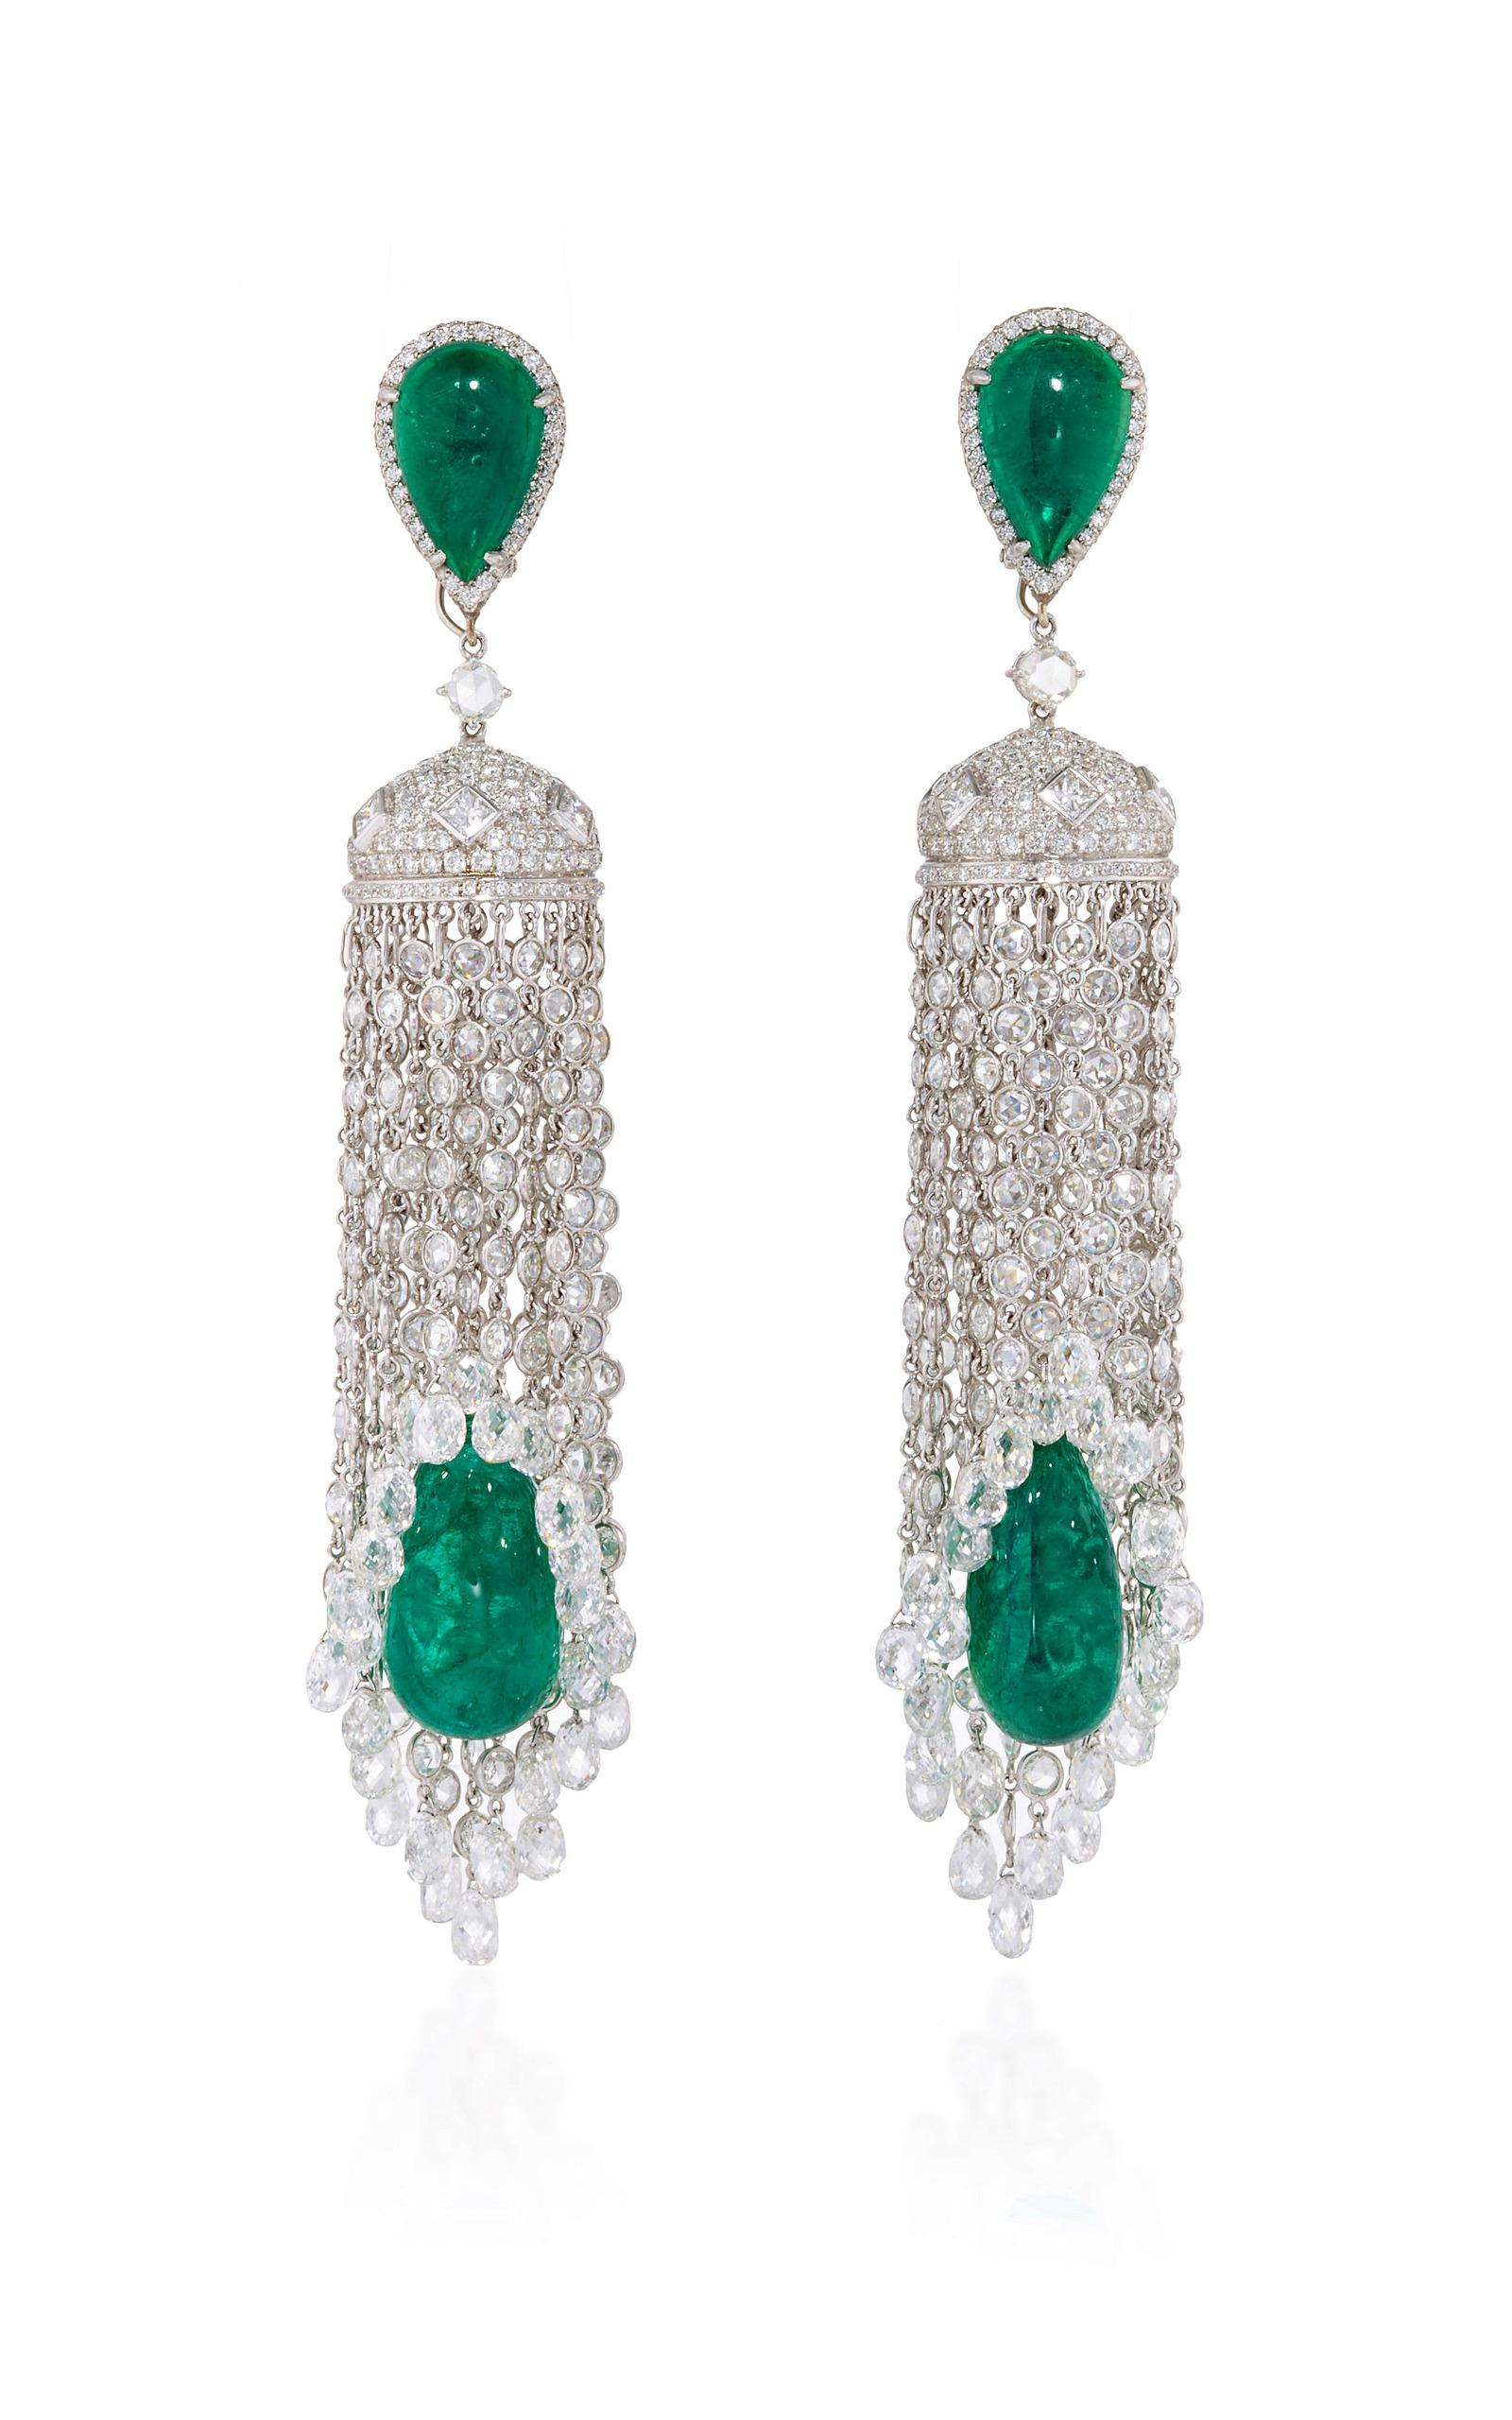 Pear Shaped and Cabochon Emerald and White Diamond | Moda Operandi